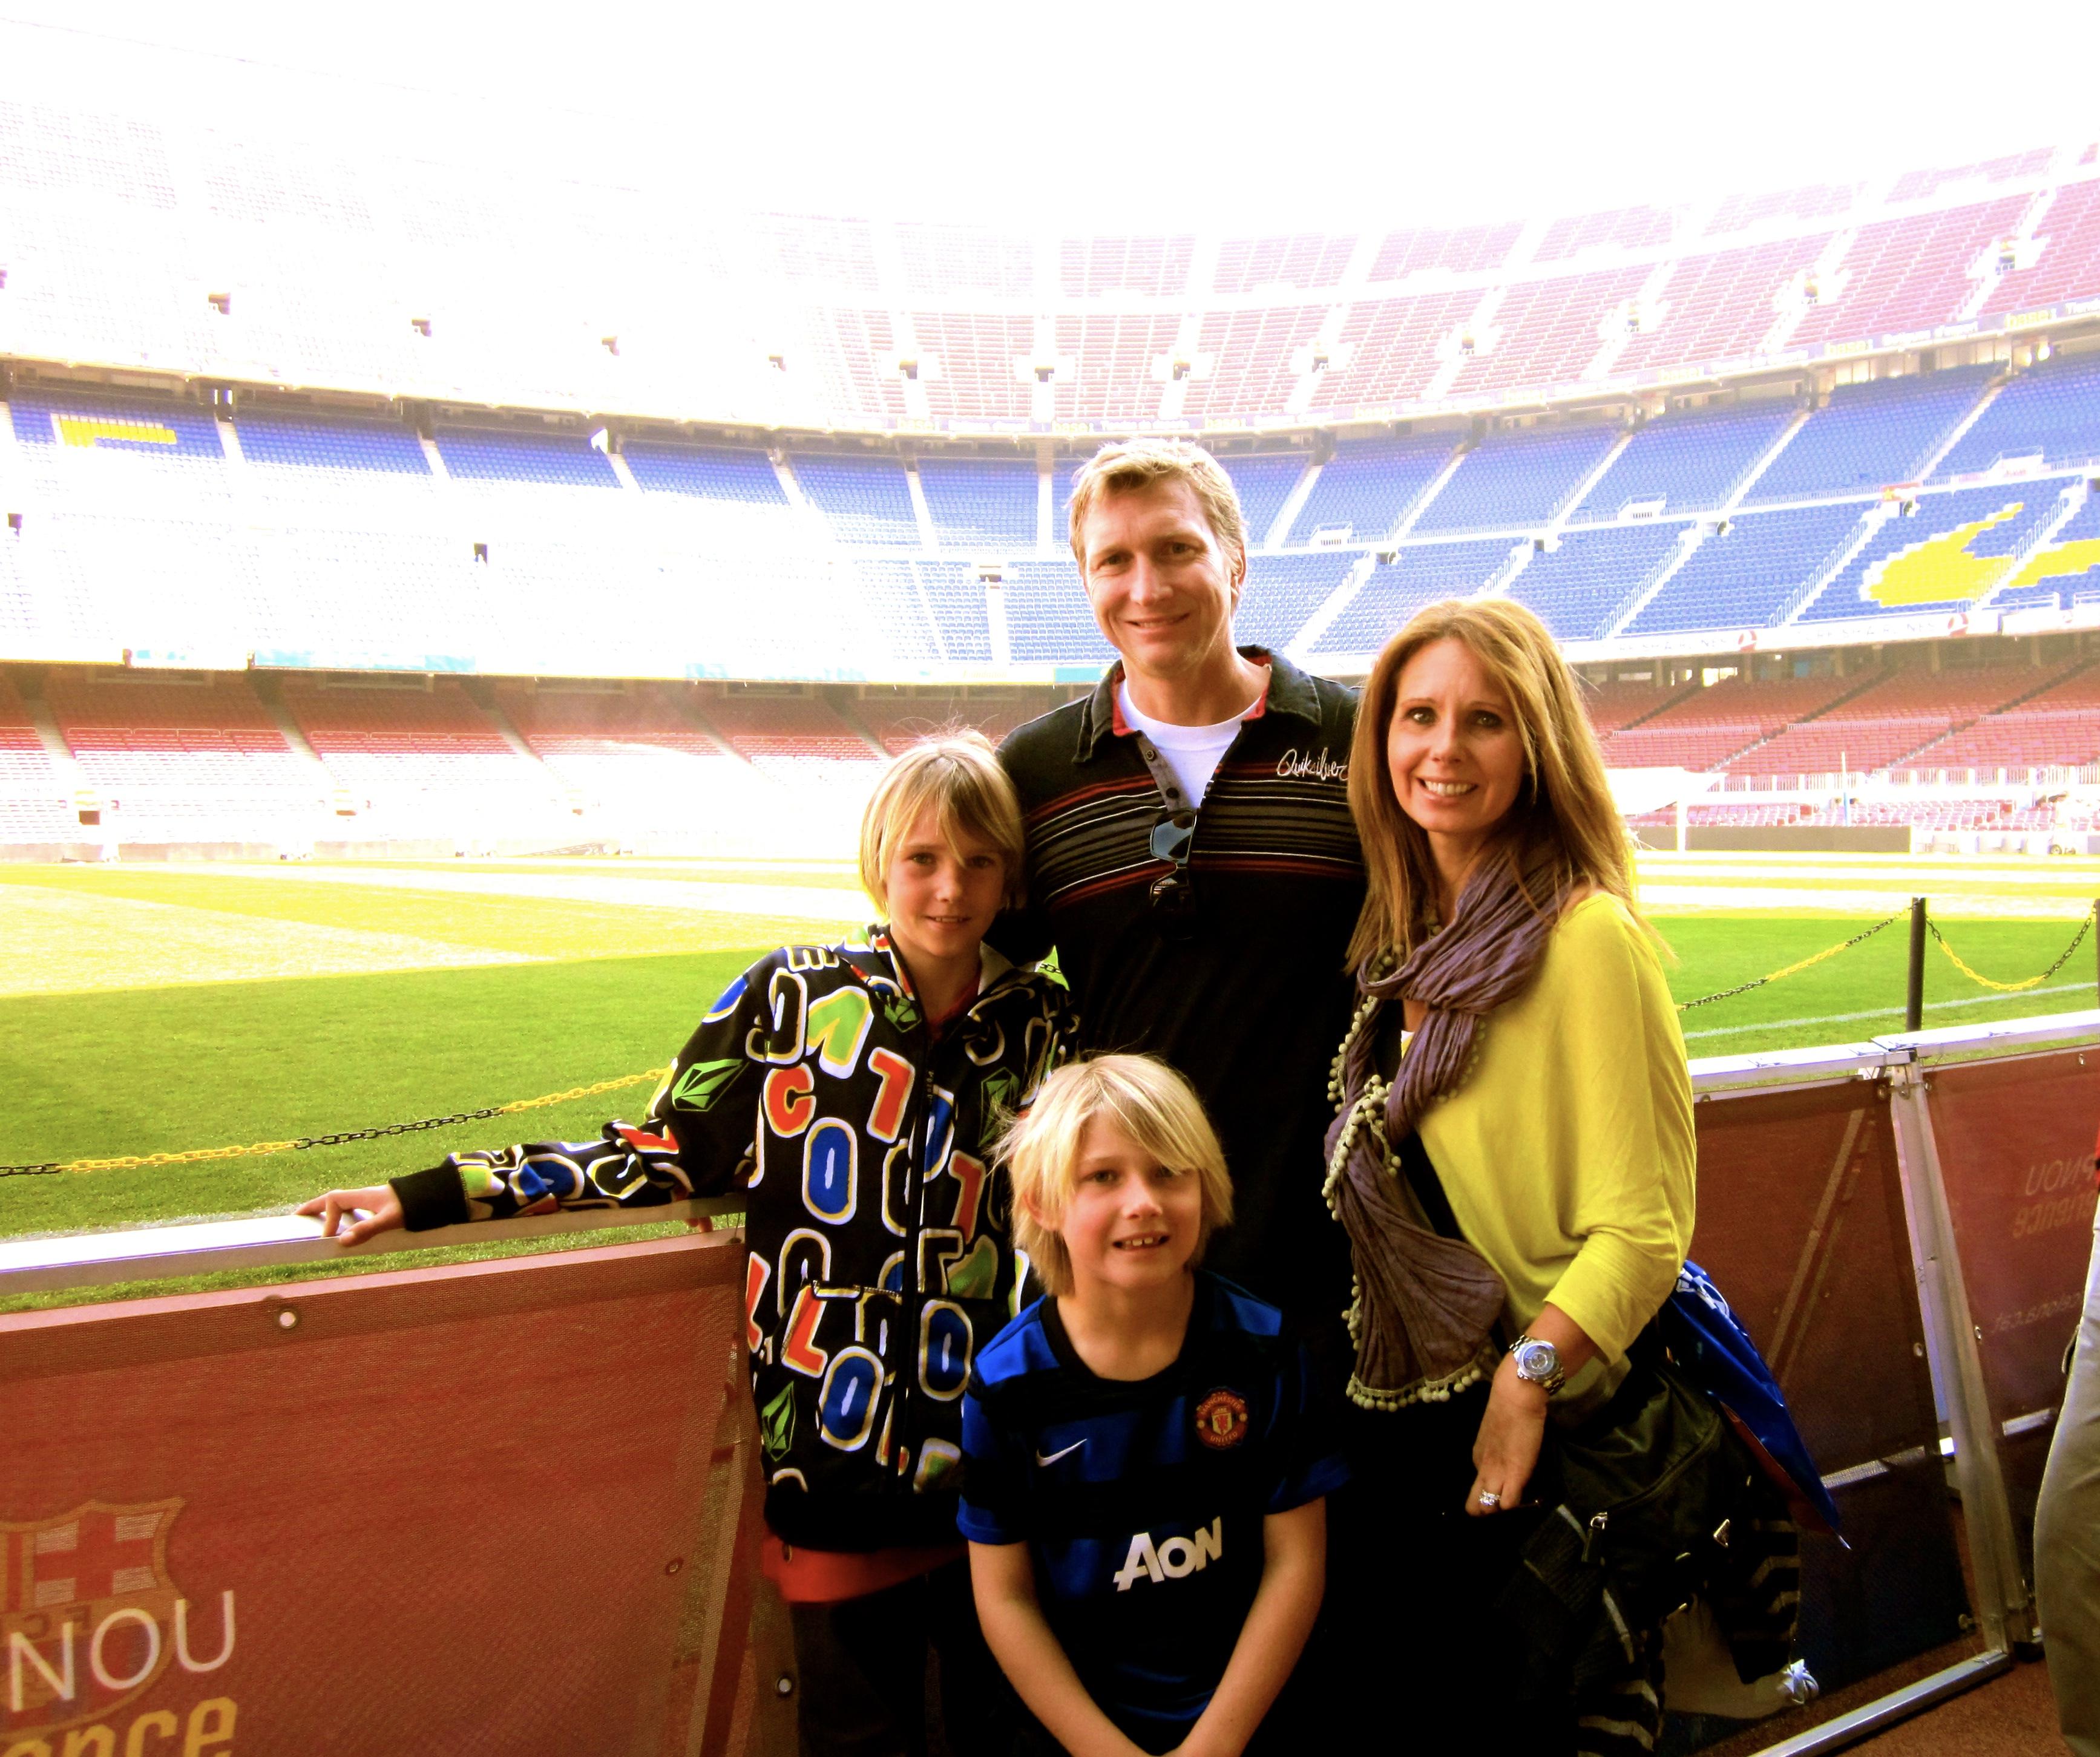 camp nou, soccer, football, barcelona spain